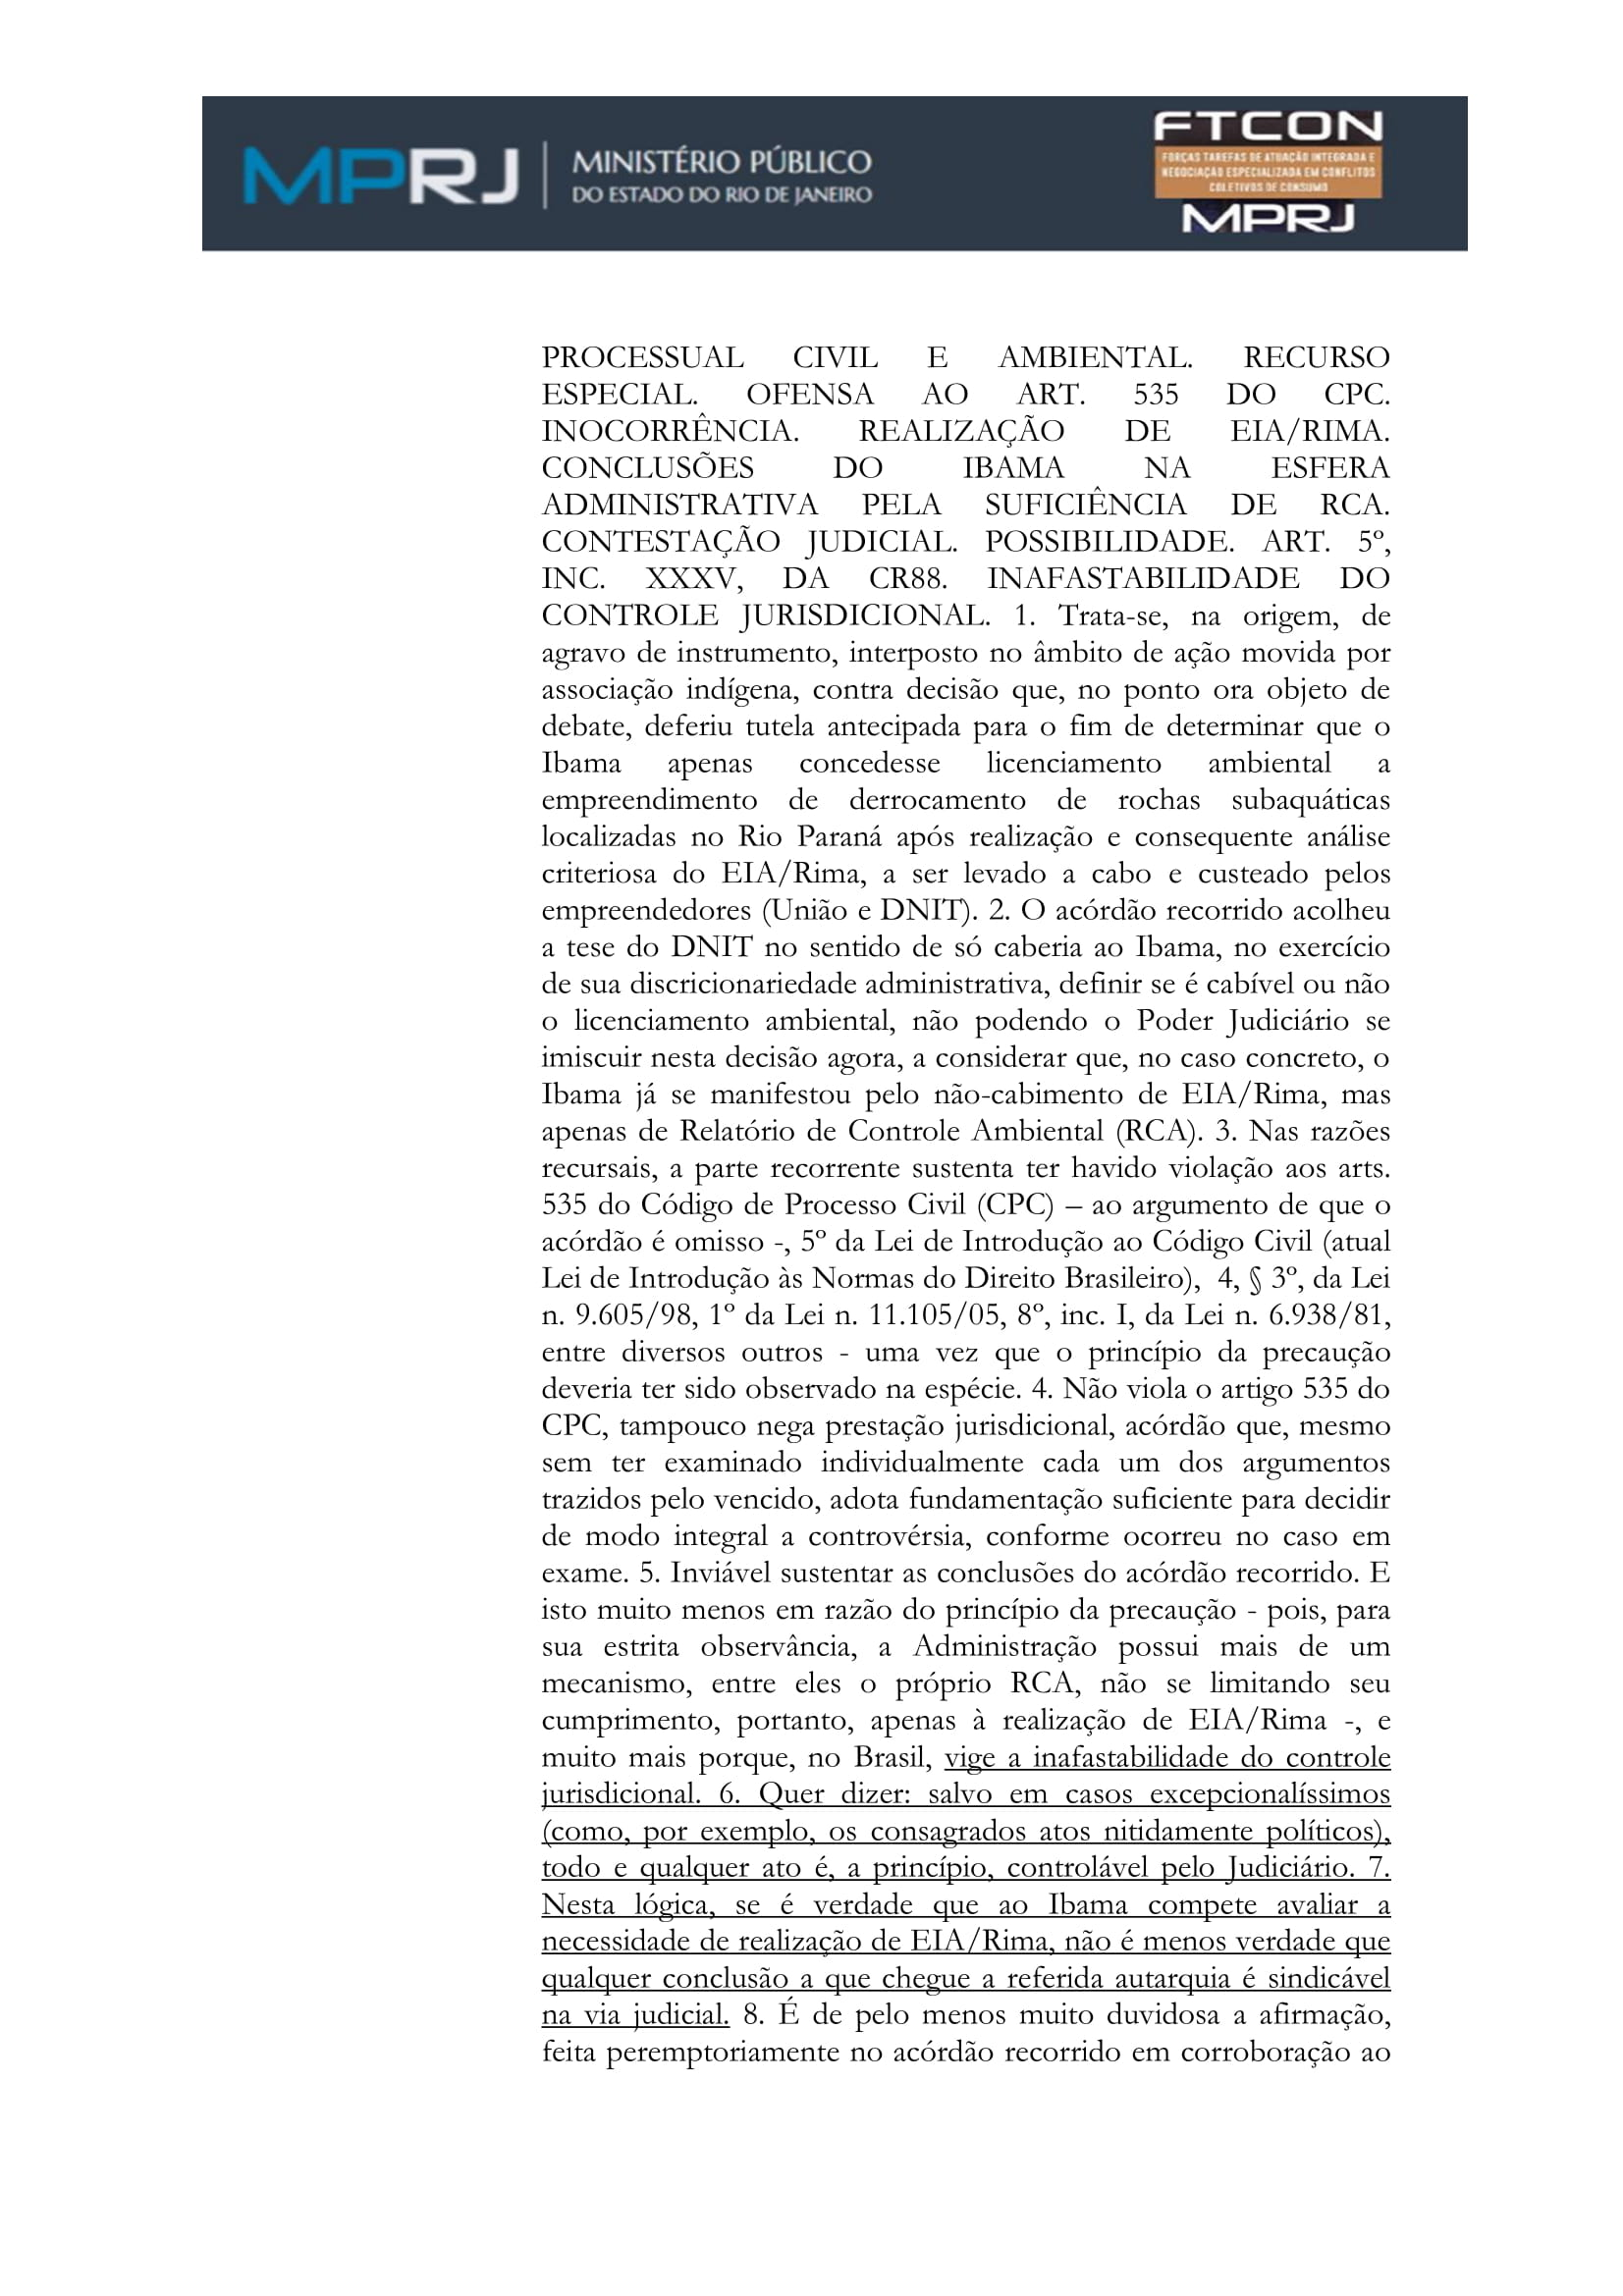 acp_caducidade_onibus_dr_rt-124